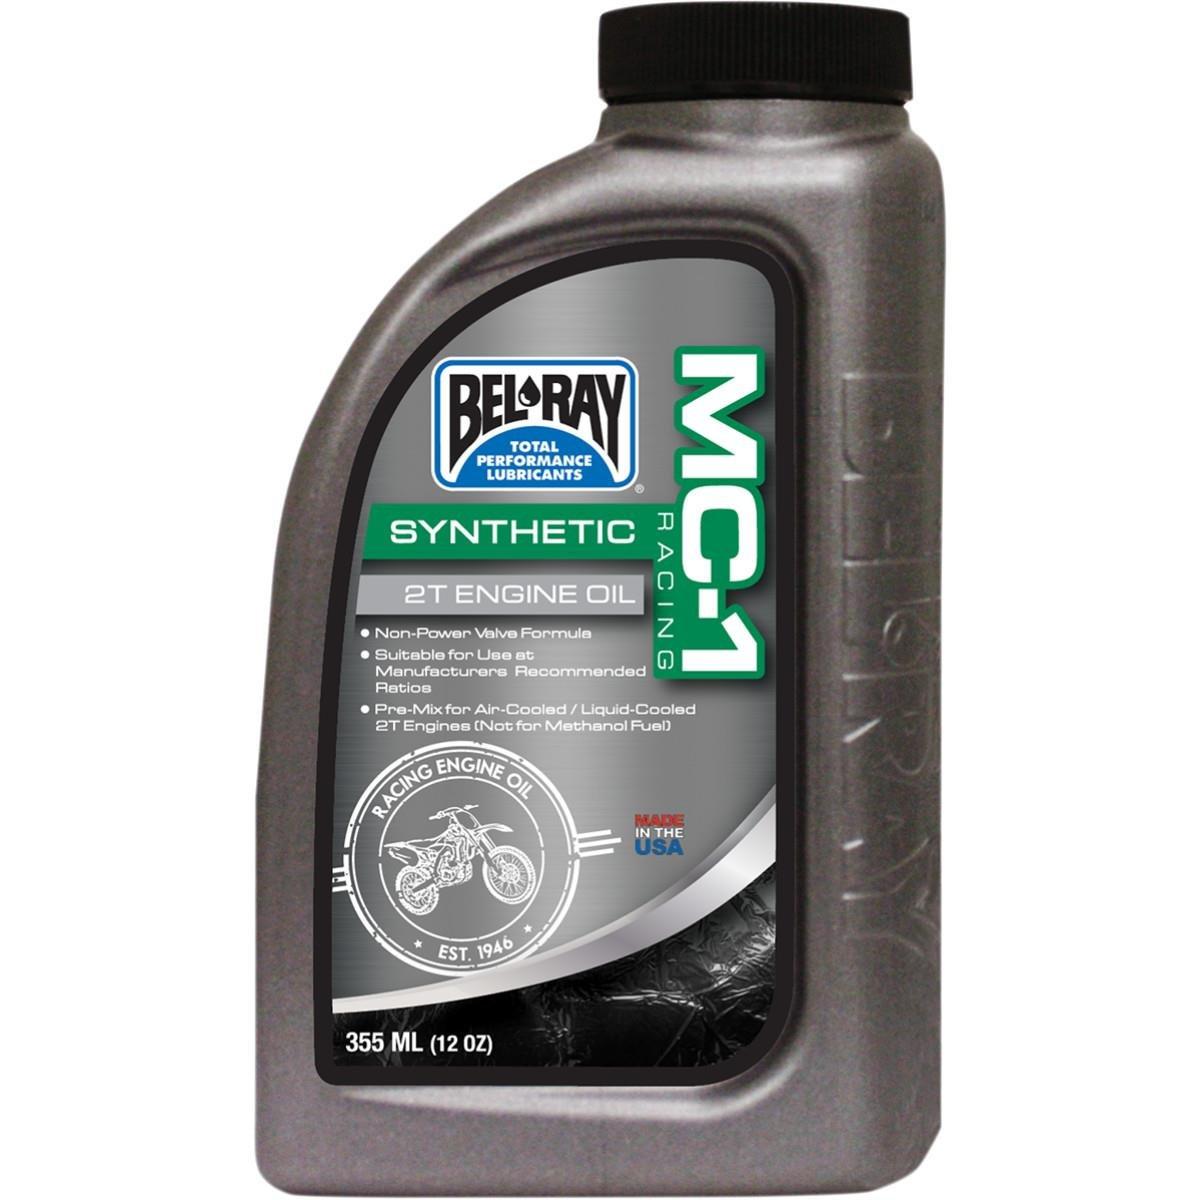 Bel-Ray MC-1 Racing Full Synthetic 2T Engine Oil - 12.8oz. 99400-B12.8 620141